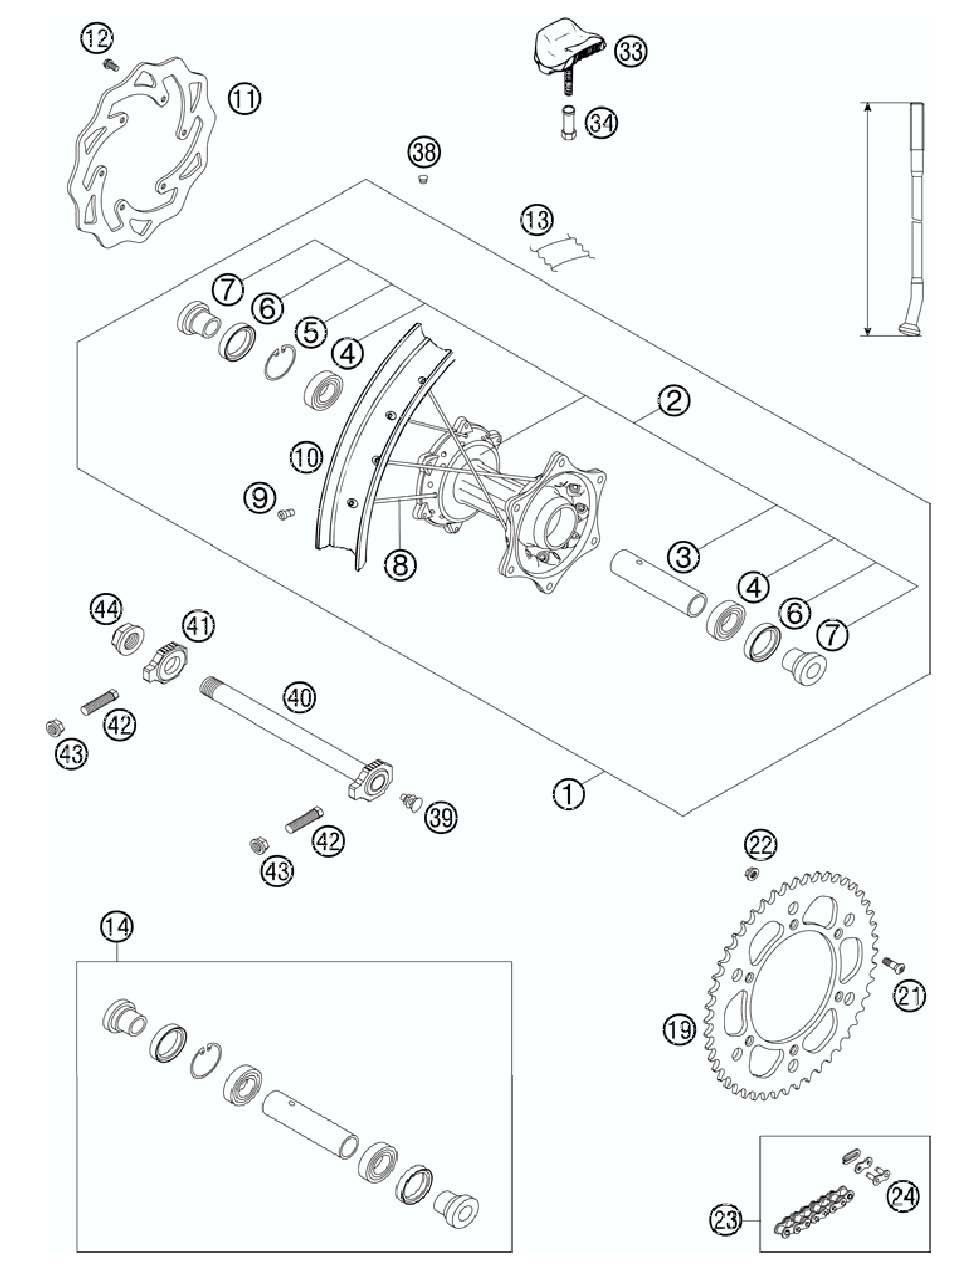 Honda Recon Wiring Diagram Auto. Honda. Auto Wiring Diagram